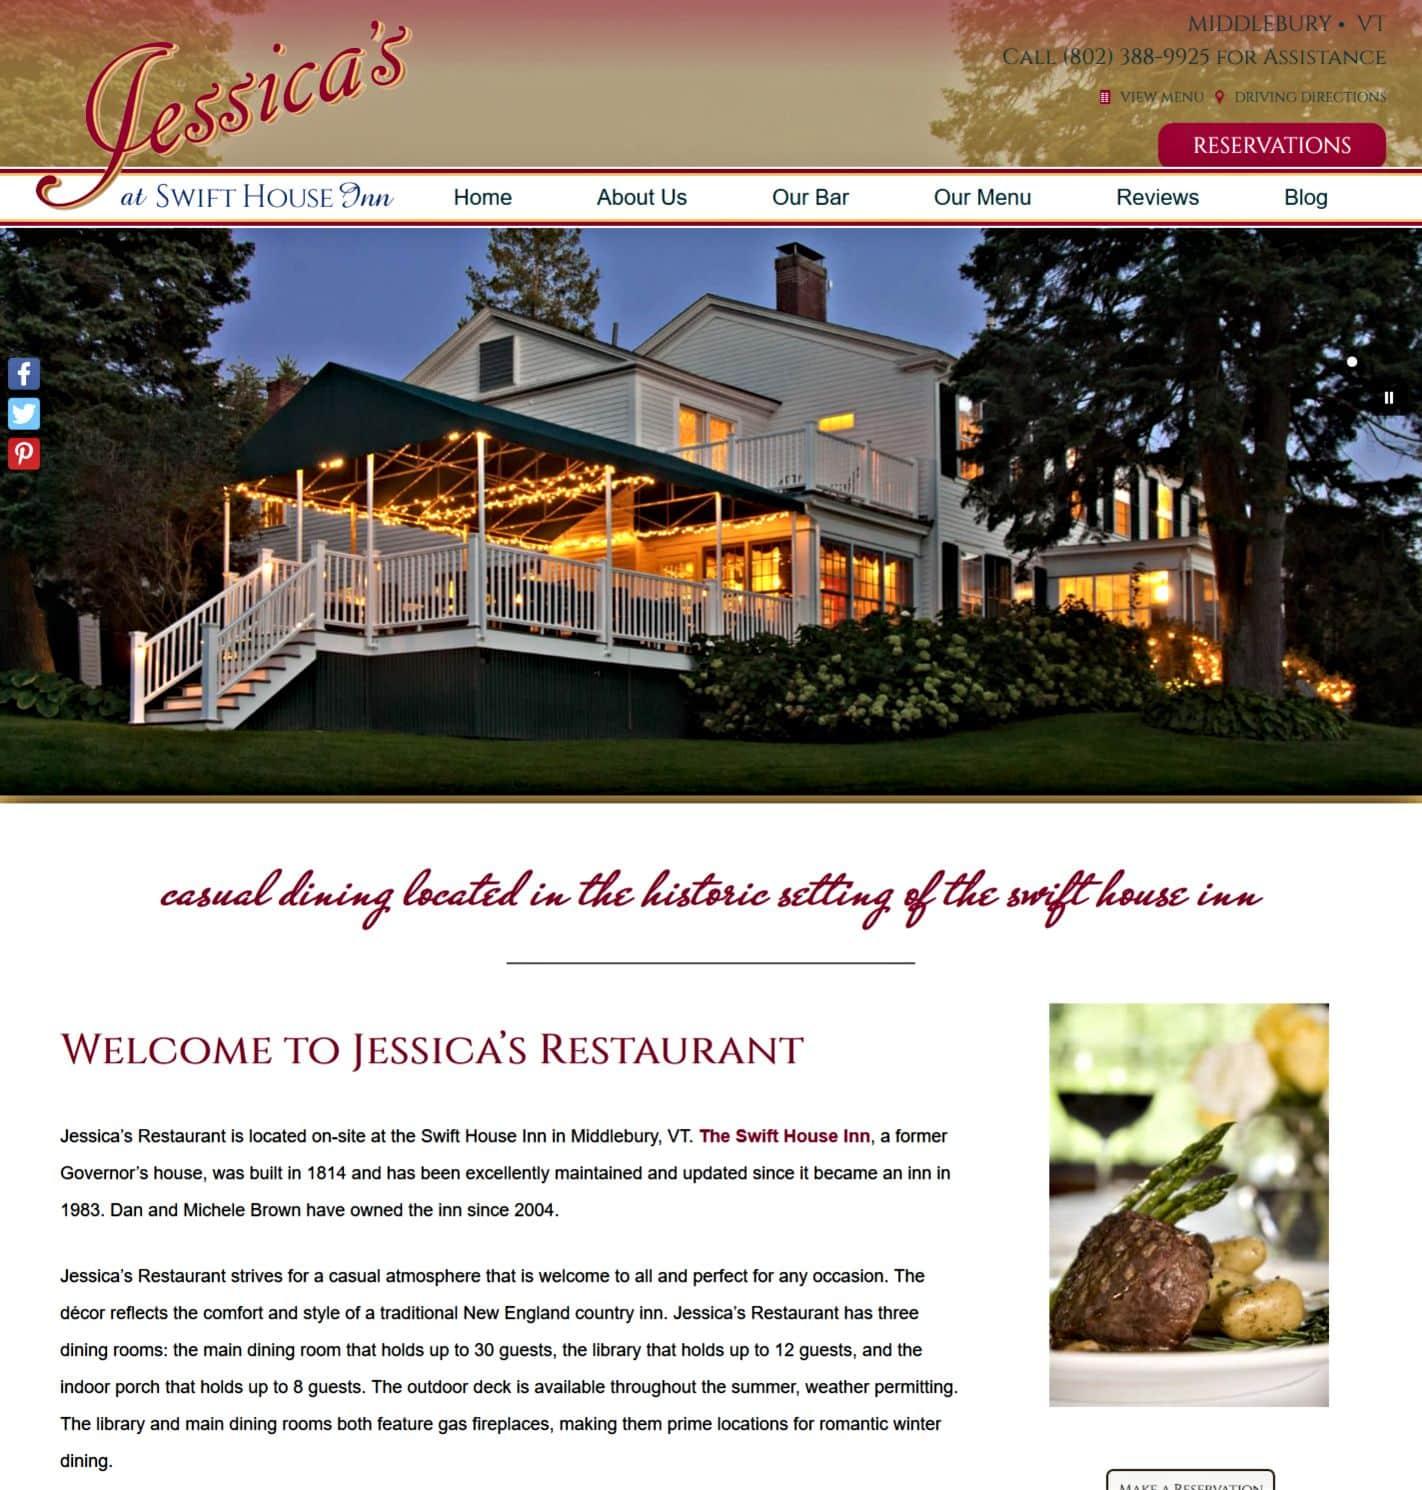 Jessica's Restaurant website home page screenshot